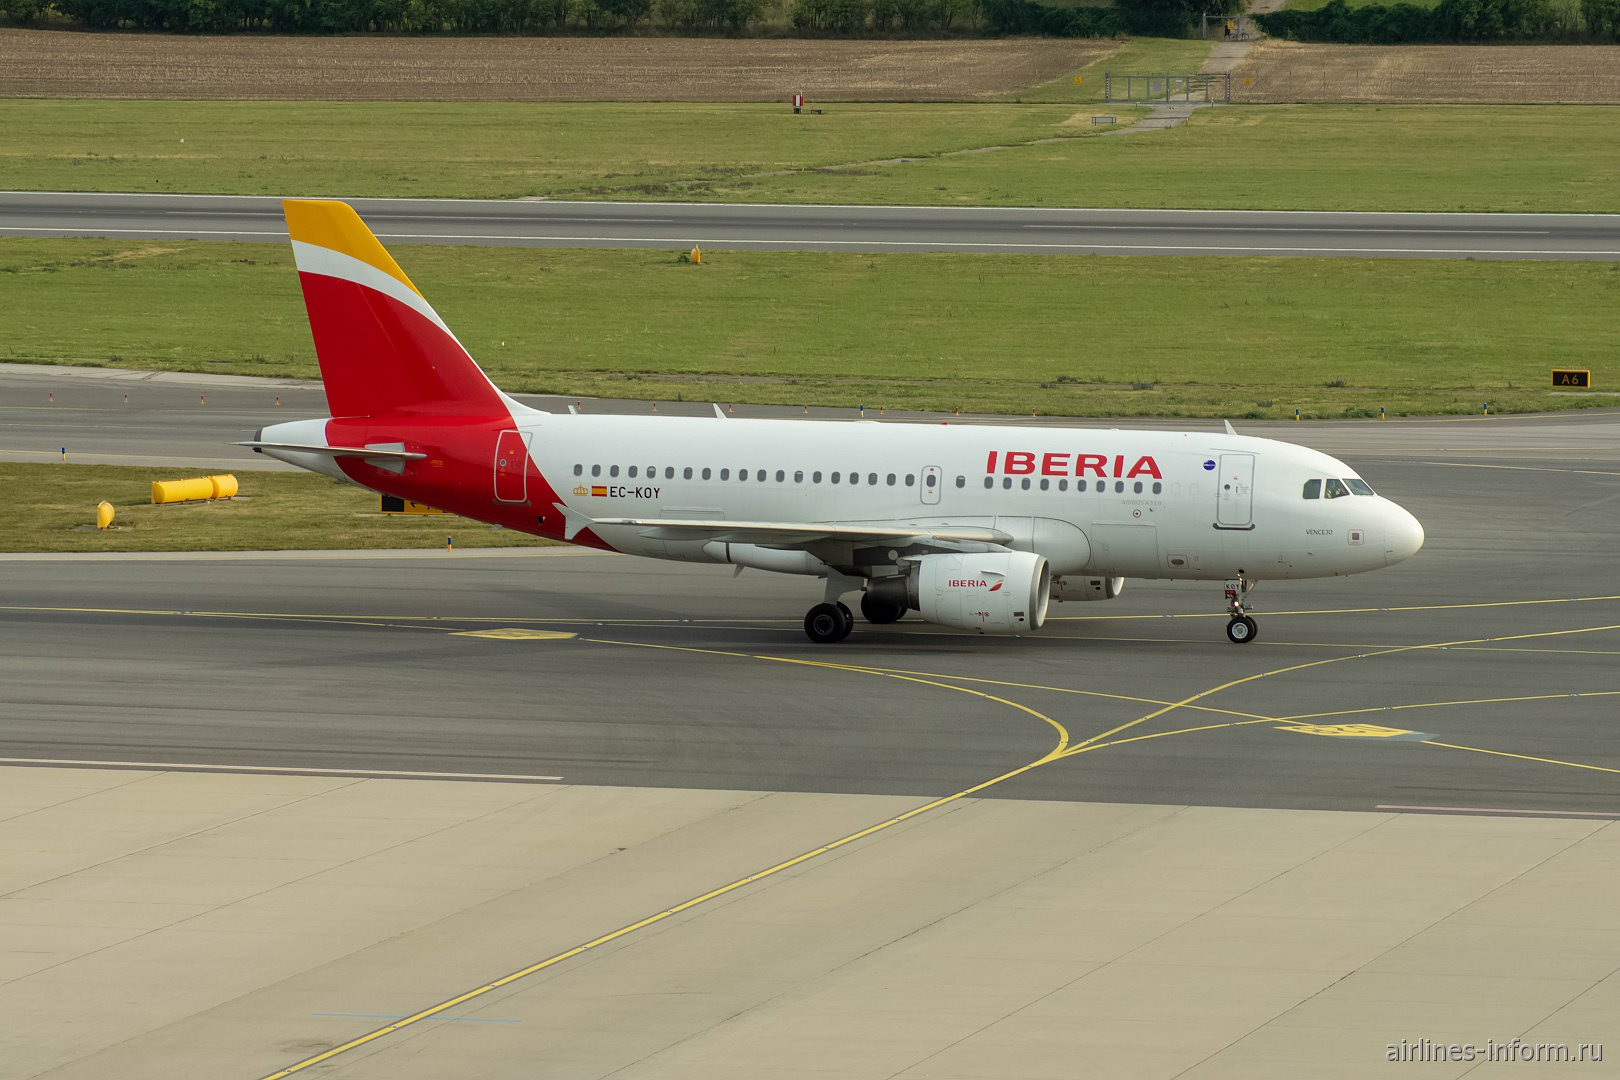 Airbus A319 EC-KOY авиакомпании Iberia в аэропорту Вена Швехат